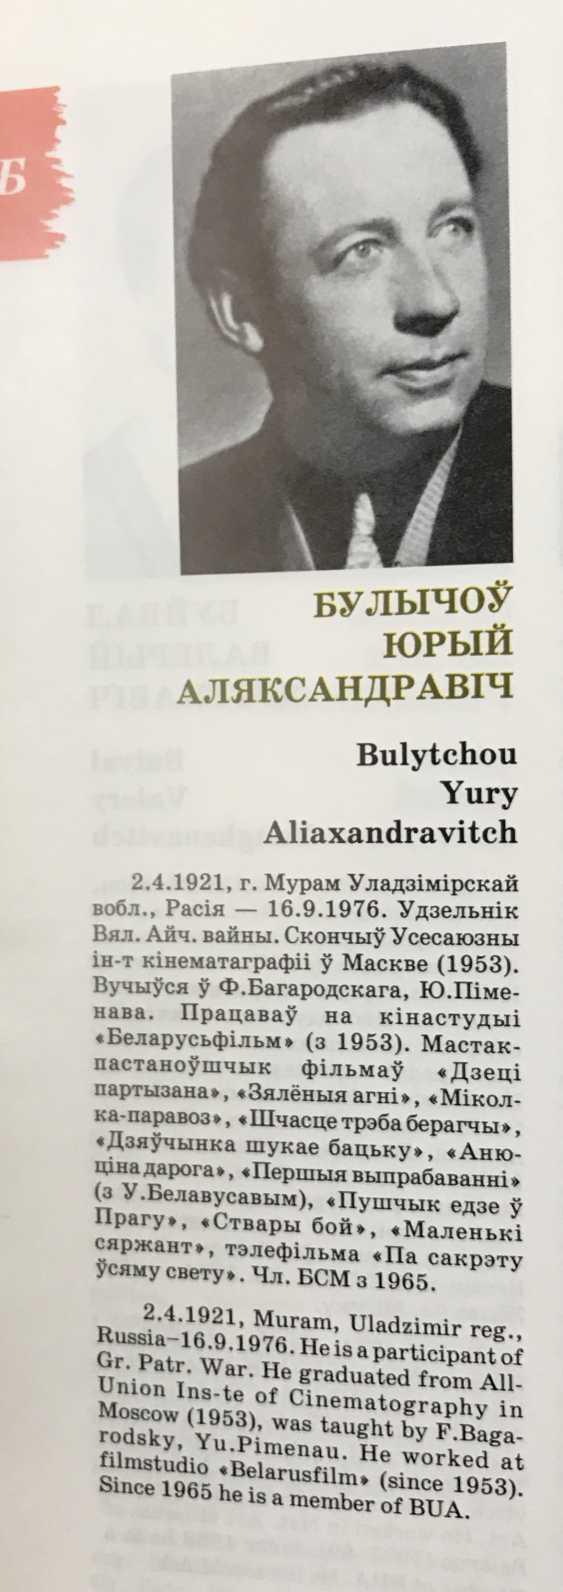 Bulychev Yu. a. Minsk, 1970 G. - photo 5